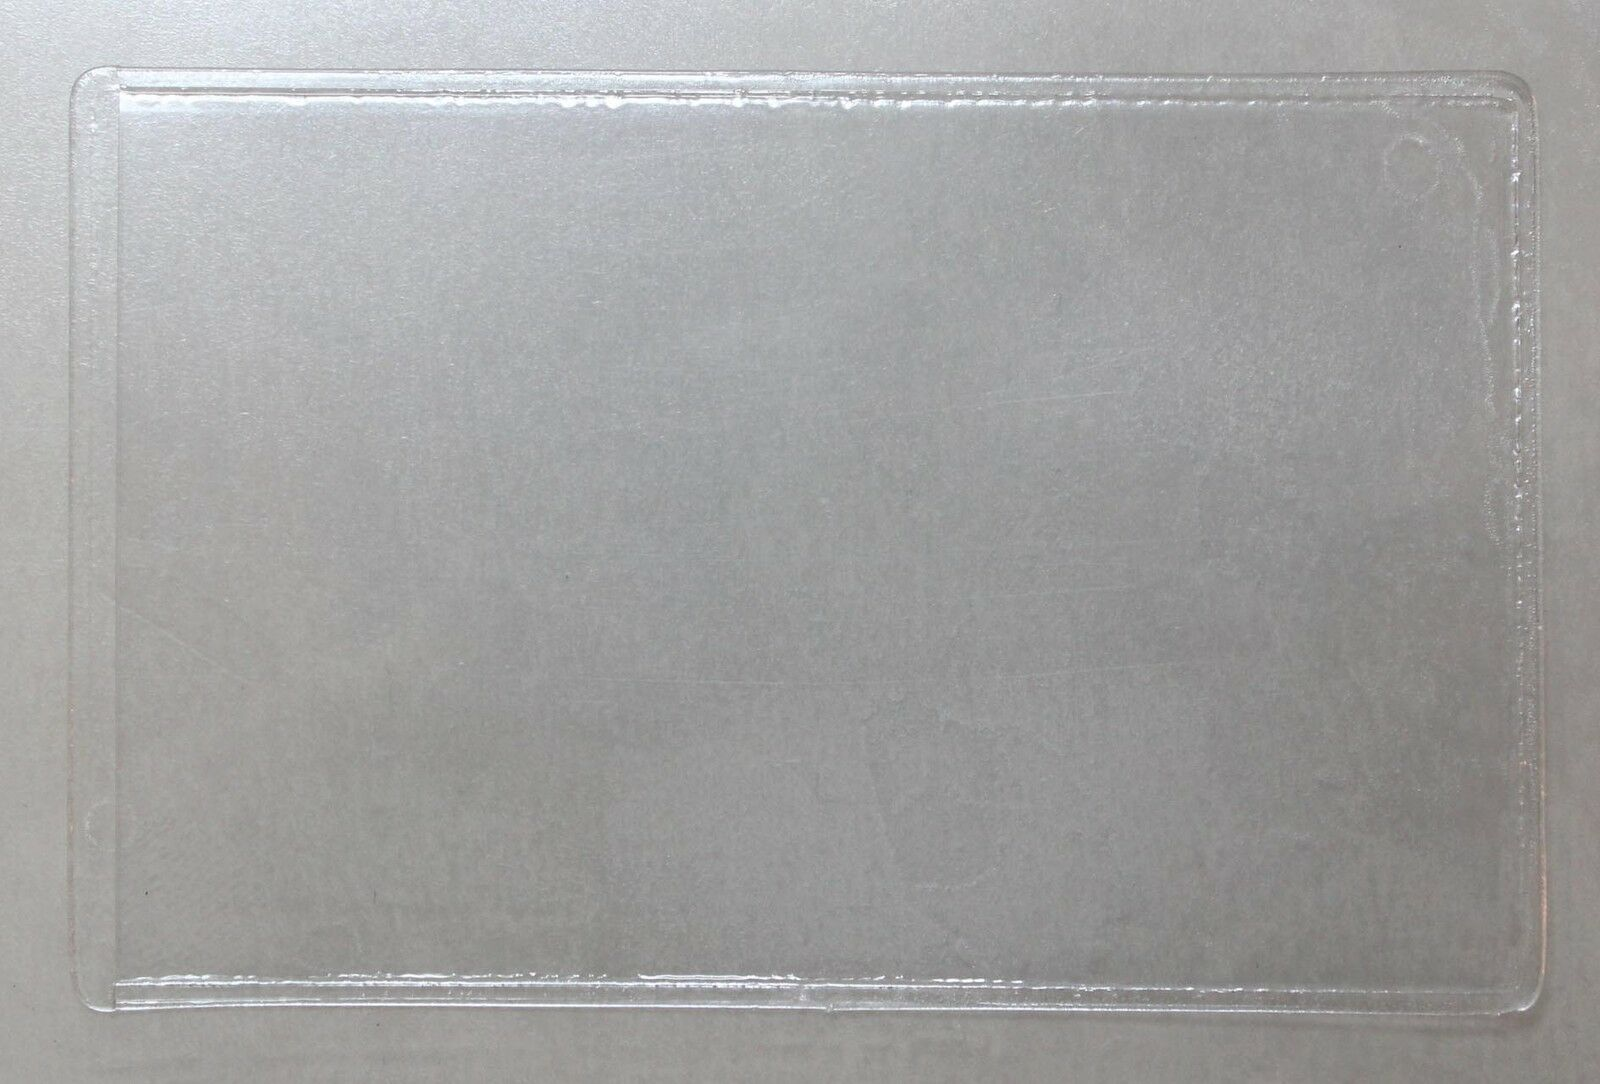 Self Adhesive Sticky Back Clear Pvc Pockets A8 A7 A6 A5 A4 Please Choose Ebay